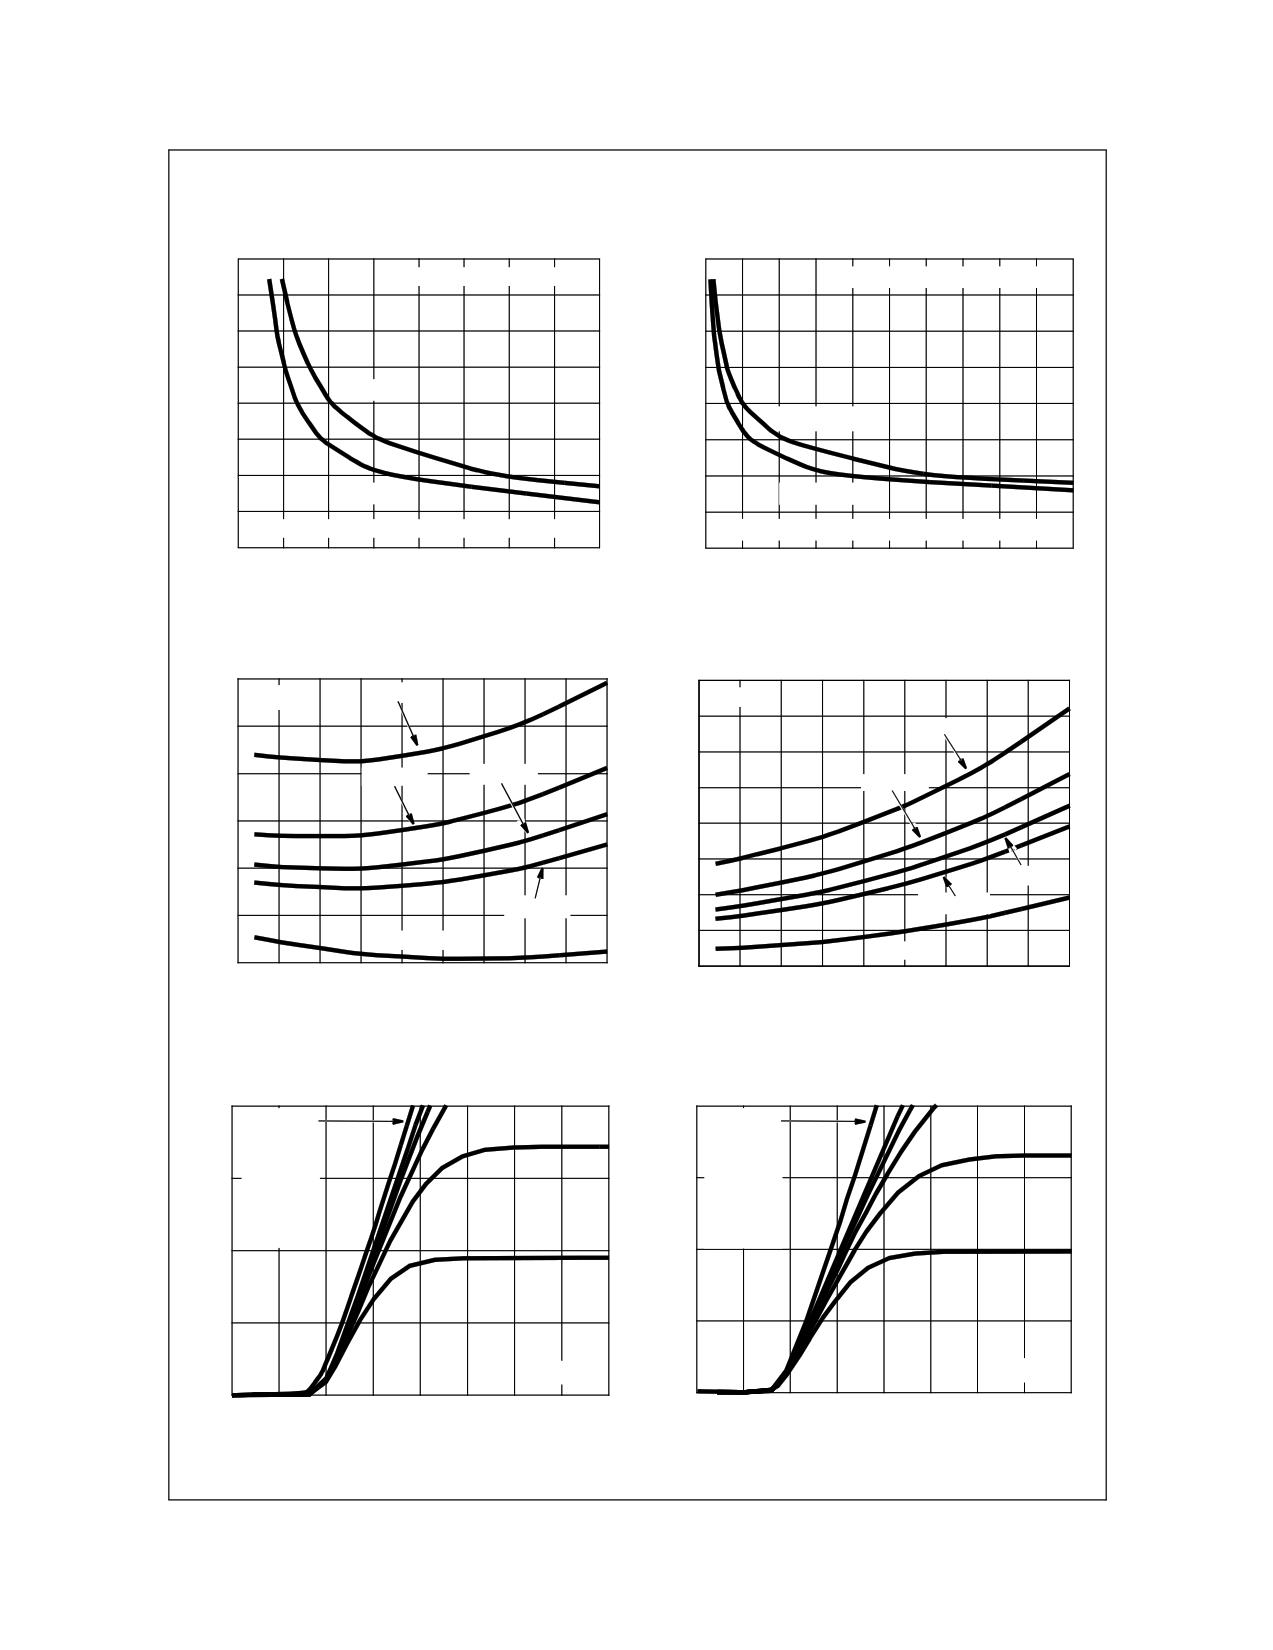 ISL9V2540S3ST pdf, 반도체, 판매, 대치품